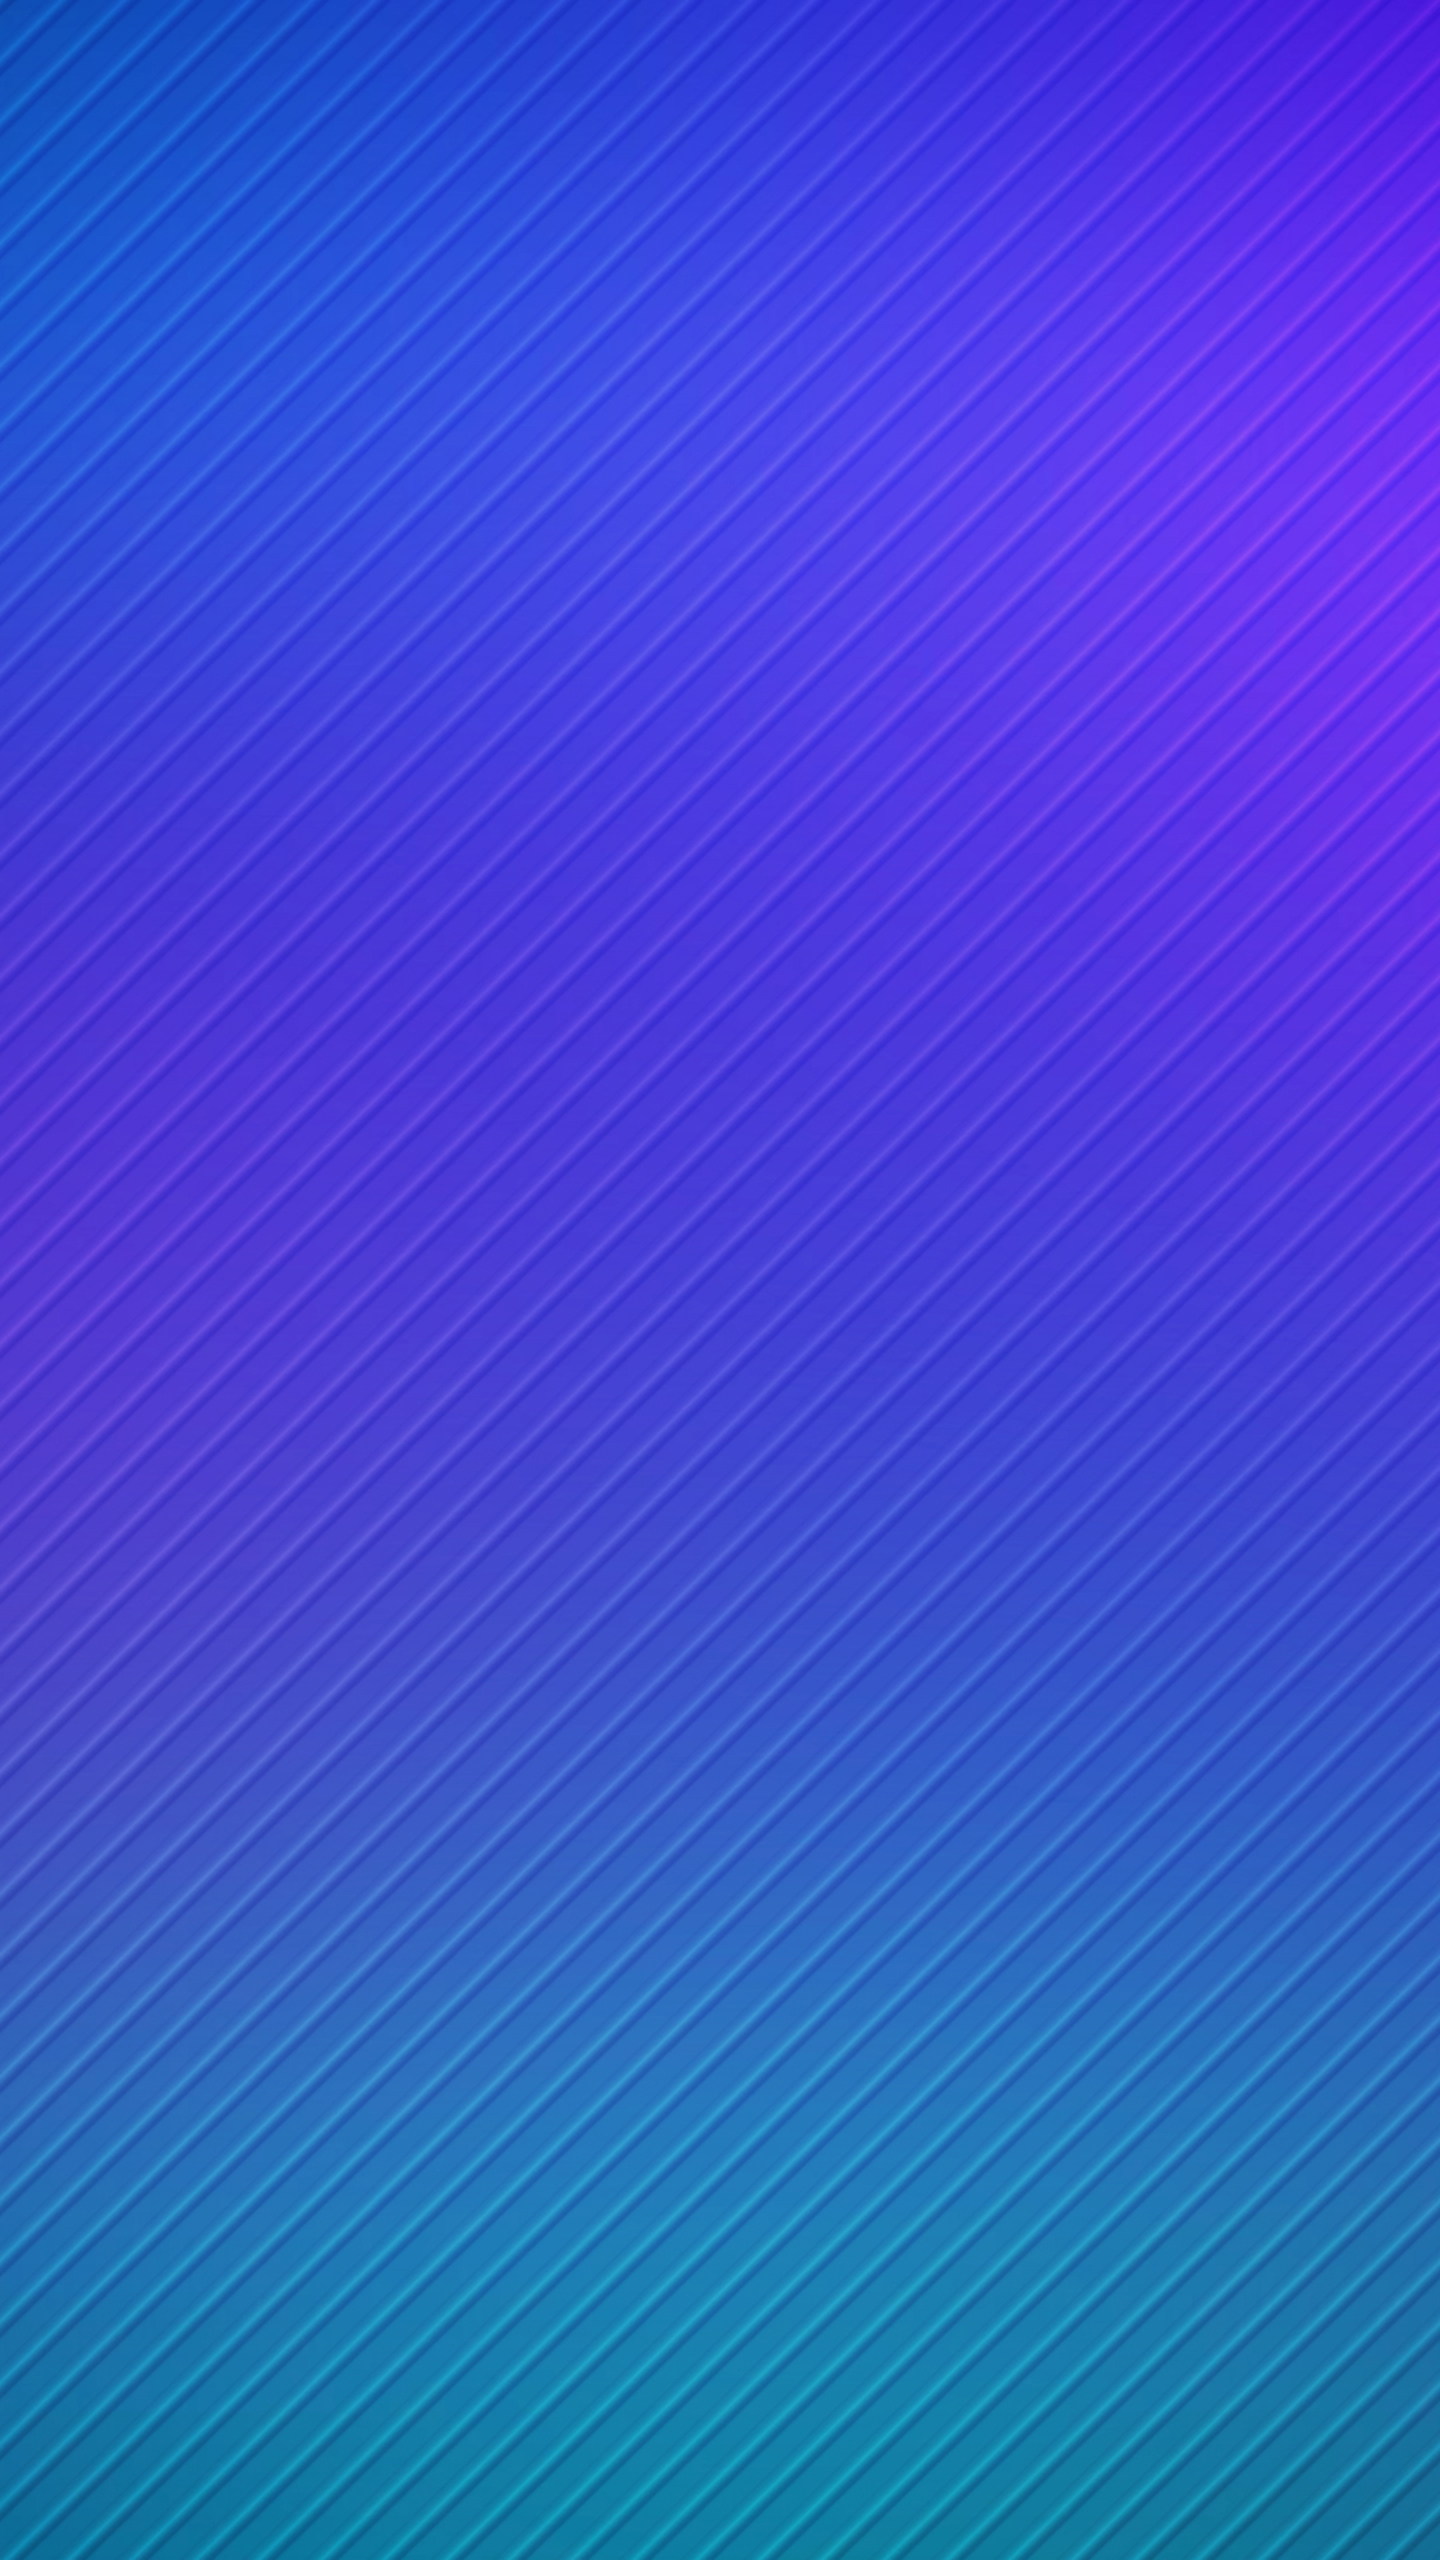 Full Color Wallpapers Galaxy S7 Edge By Mattiebonez On Deviantart